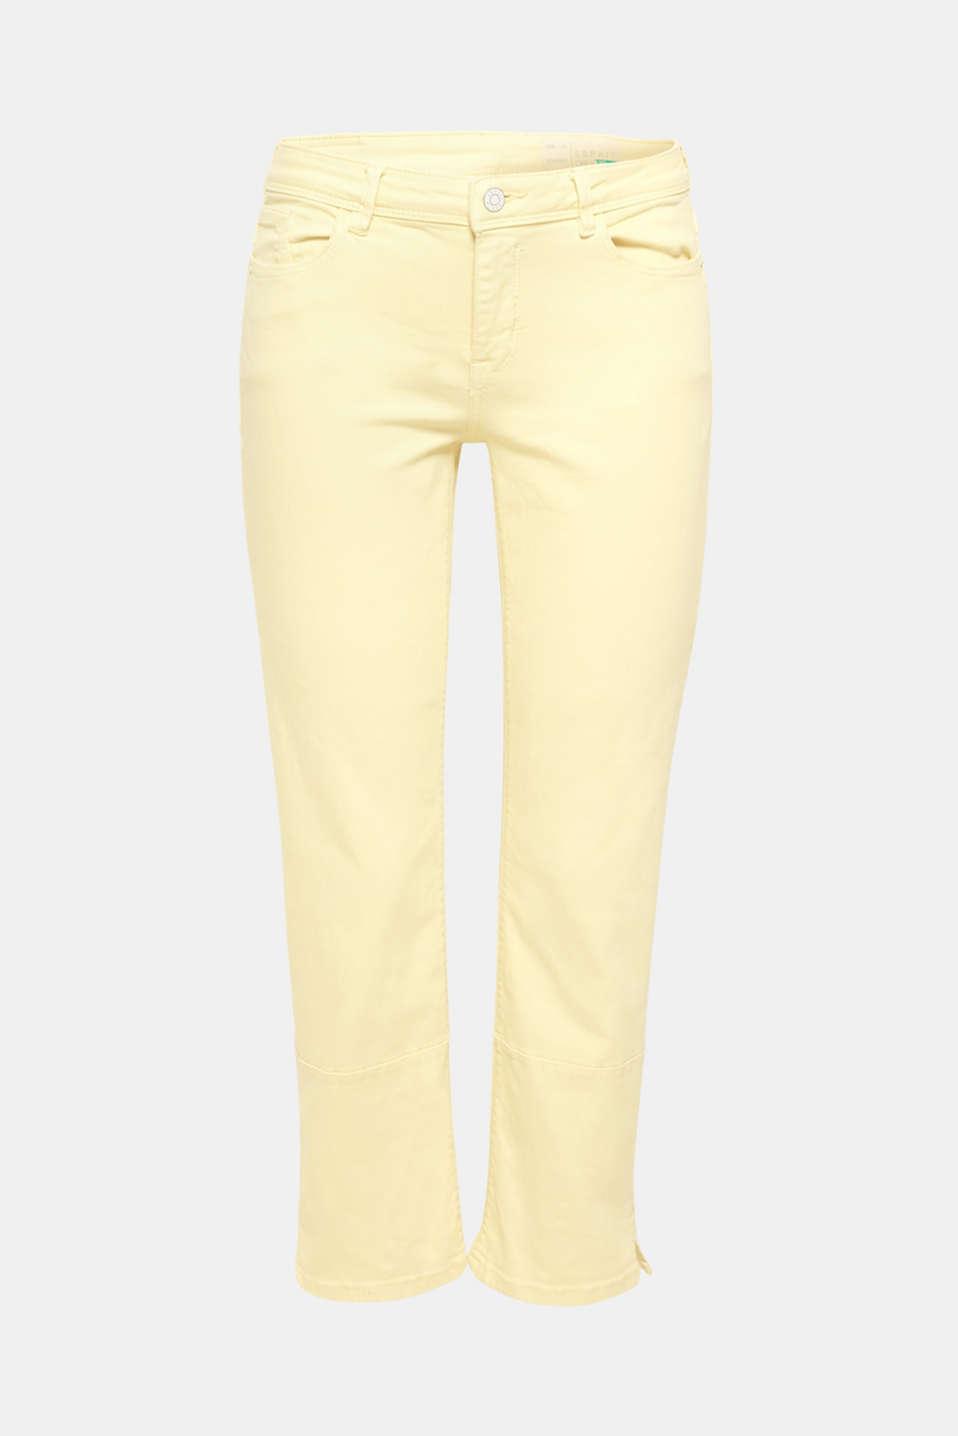 Pants denim, LIGHT YELLOW, detail image number 7